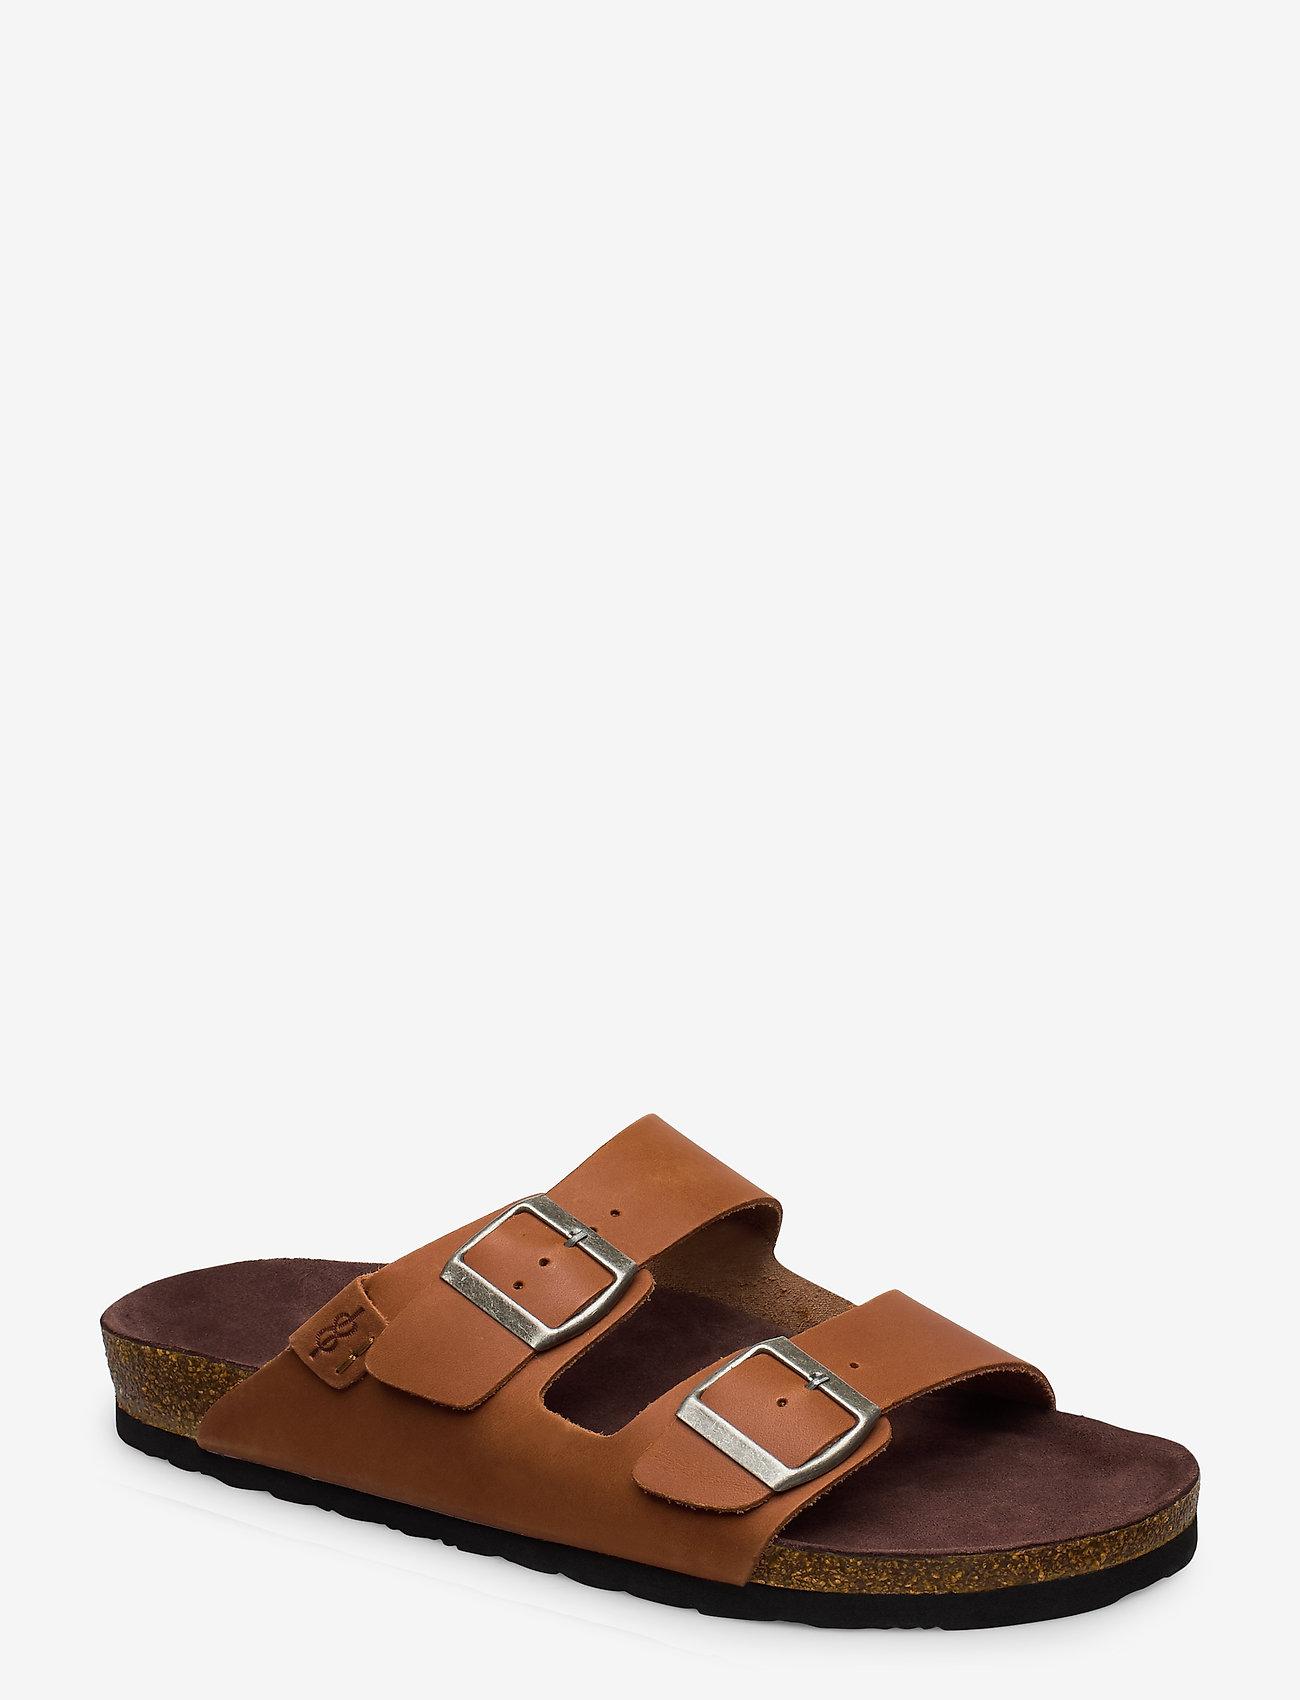 Marstrand - VANT - sandały - tan - 0